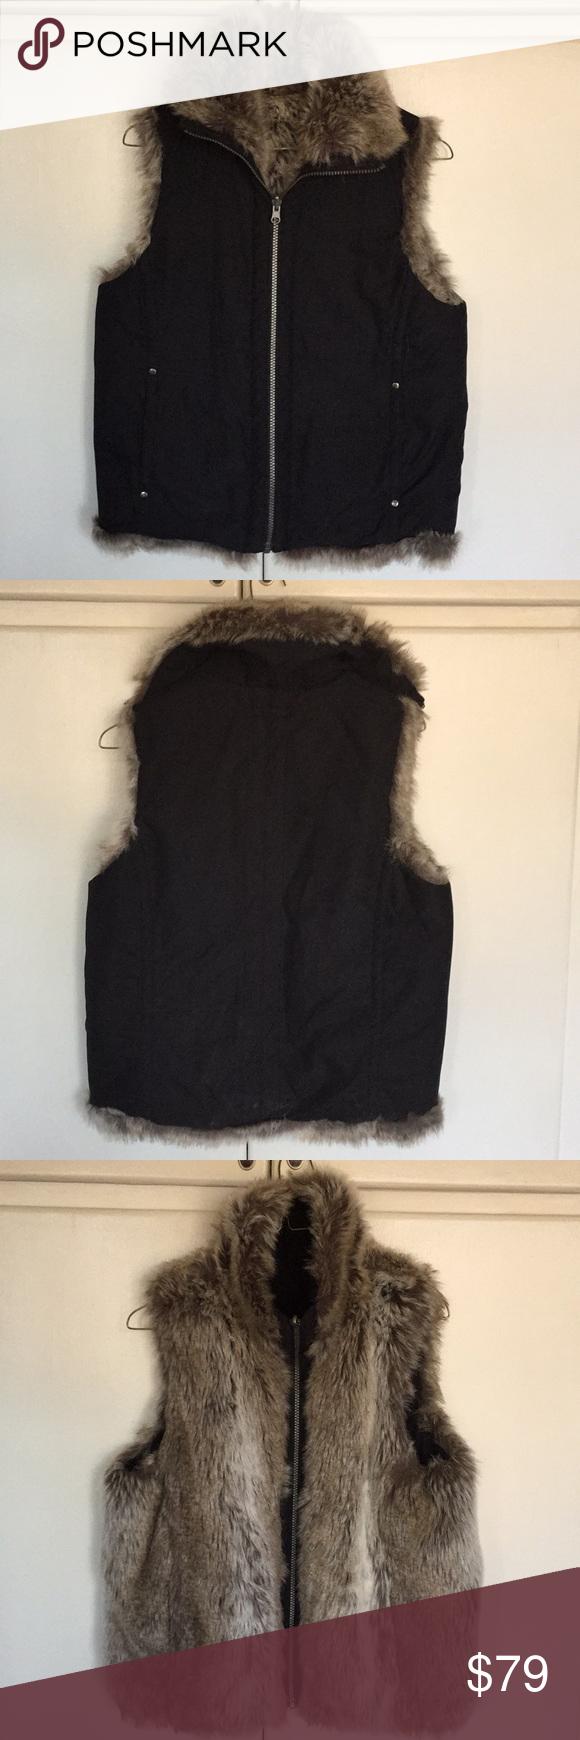 Weatherproof Reversible Faux Fur Vest NWOT Weatherproof reversible faux fur/ micro suede zippered vest Weatherproof Jackets & Coats Vests